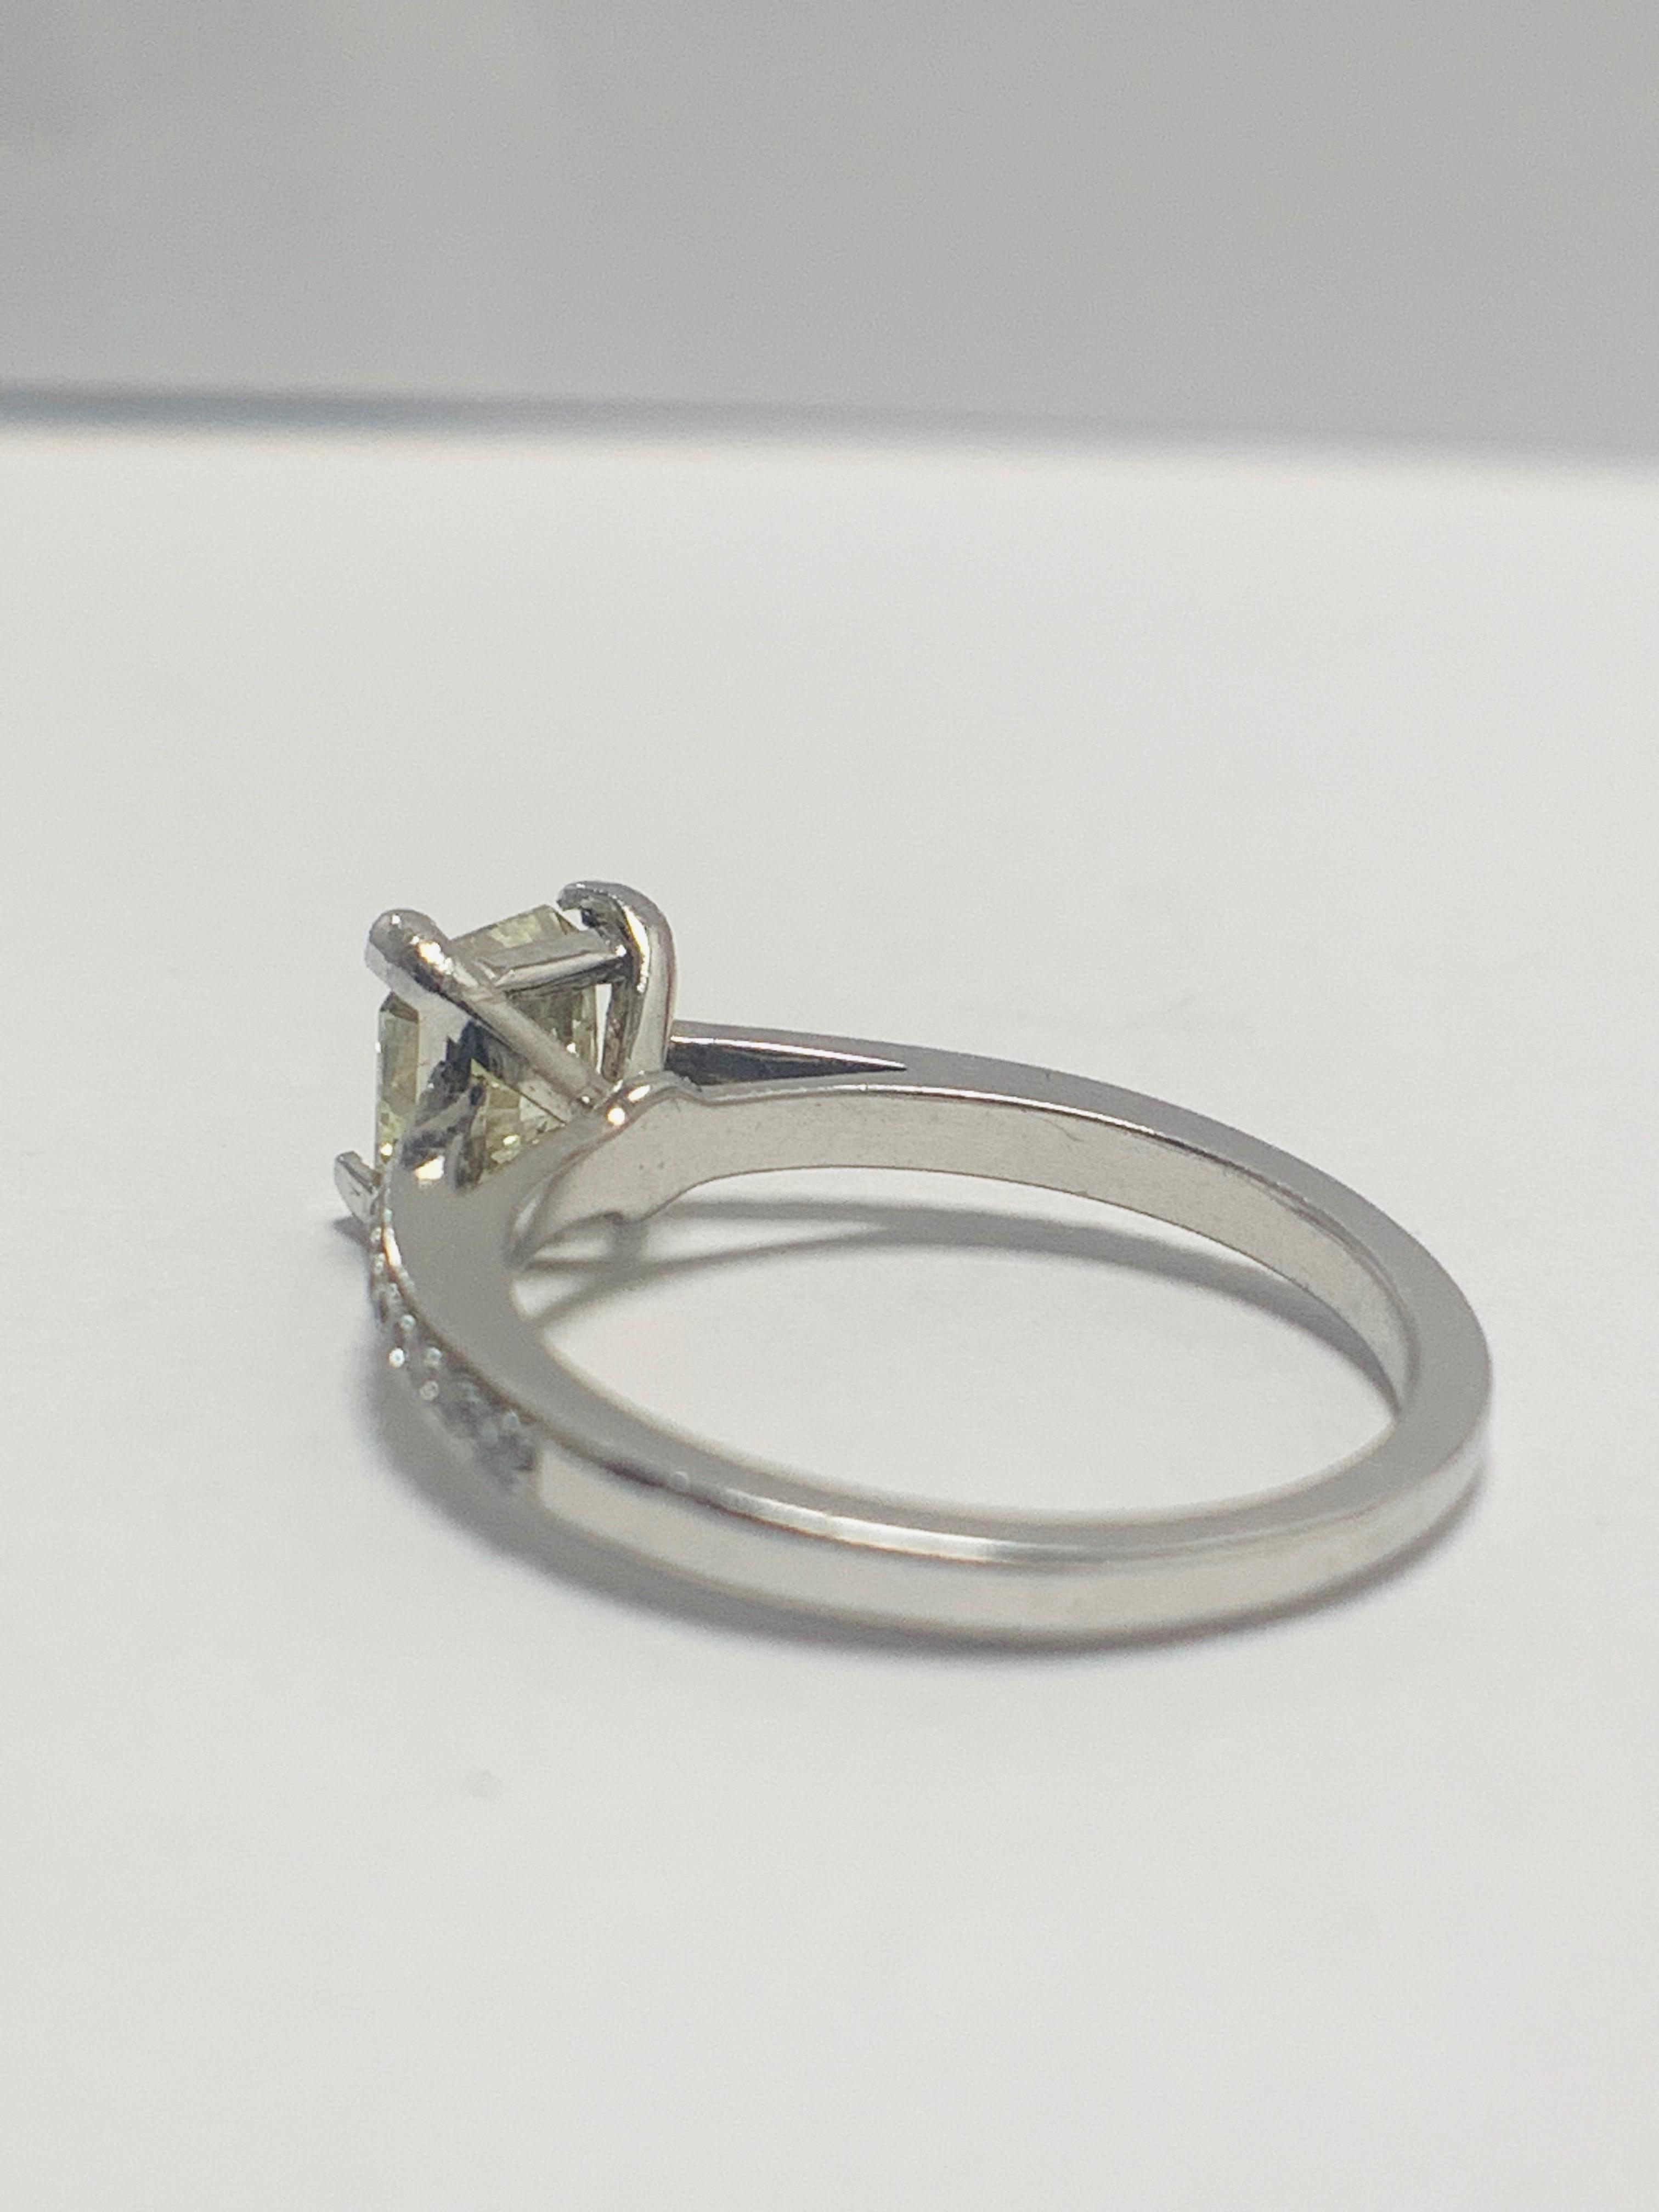 Lot 20 - 1ct Cushion Cut Platinum Diamond Solitaire Ring